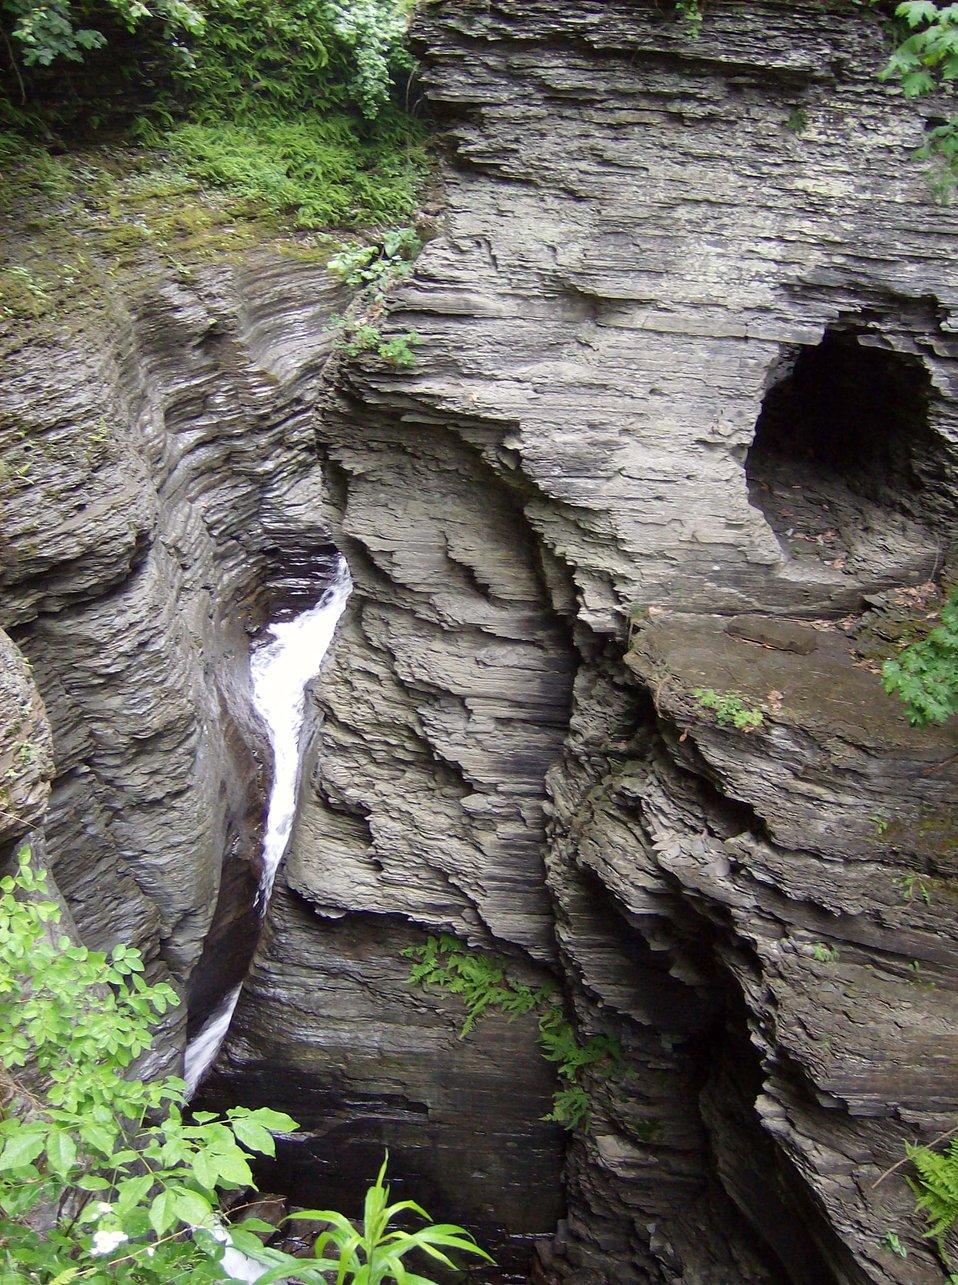 Stream following a steep and narrow canyon at Watkins Glen State Park.